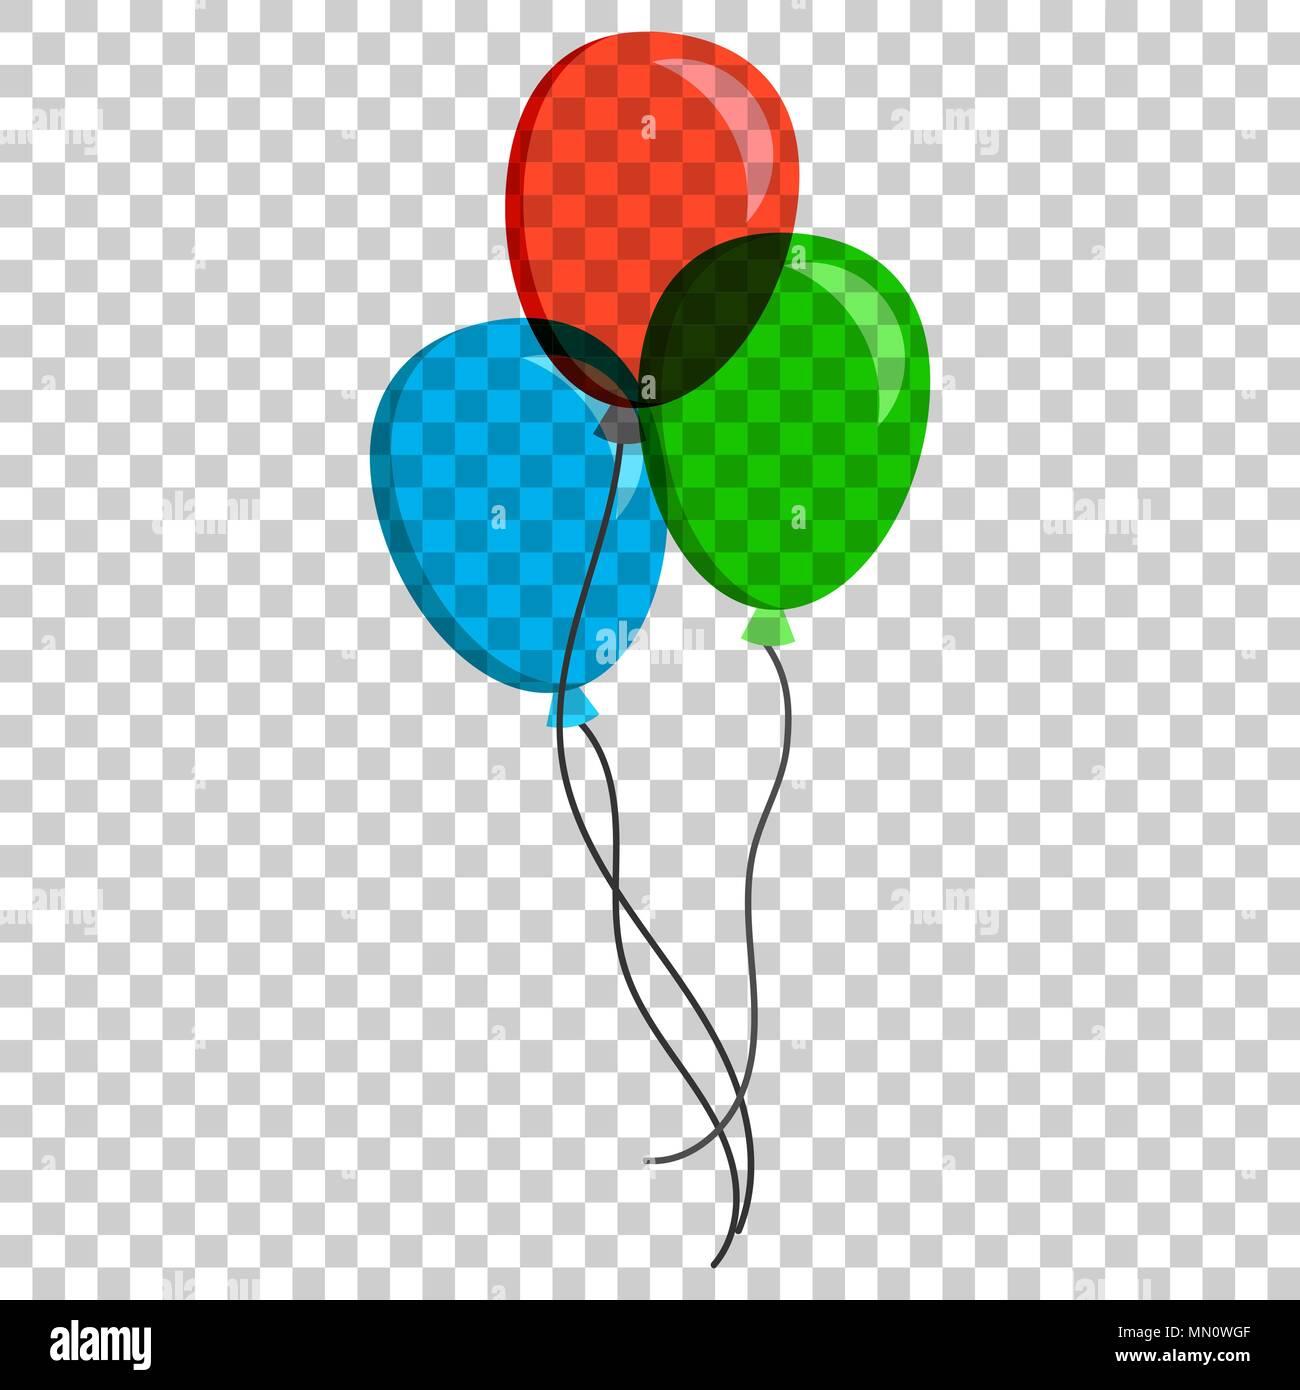 Heissluftballon Flachbild Vektor Icon Geburtstag Ballon Abbildung